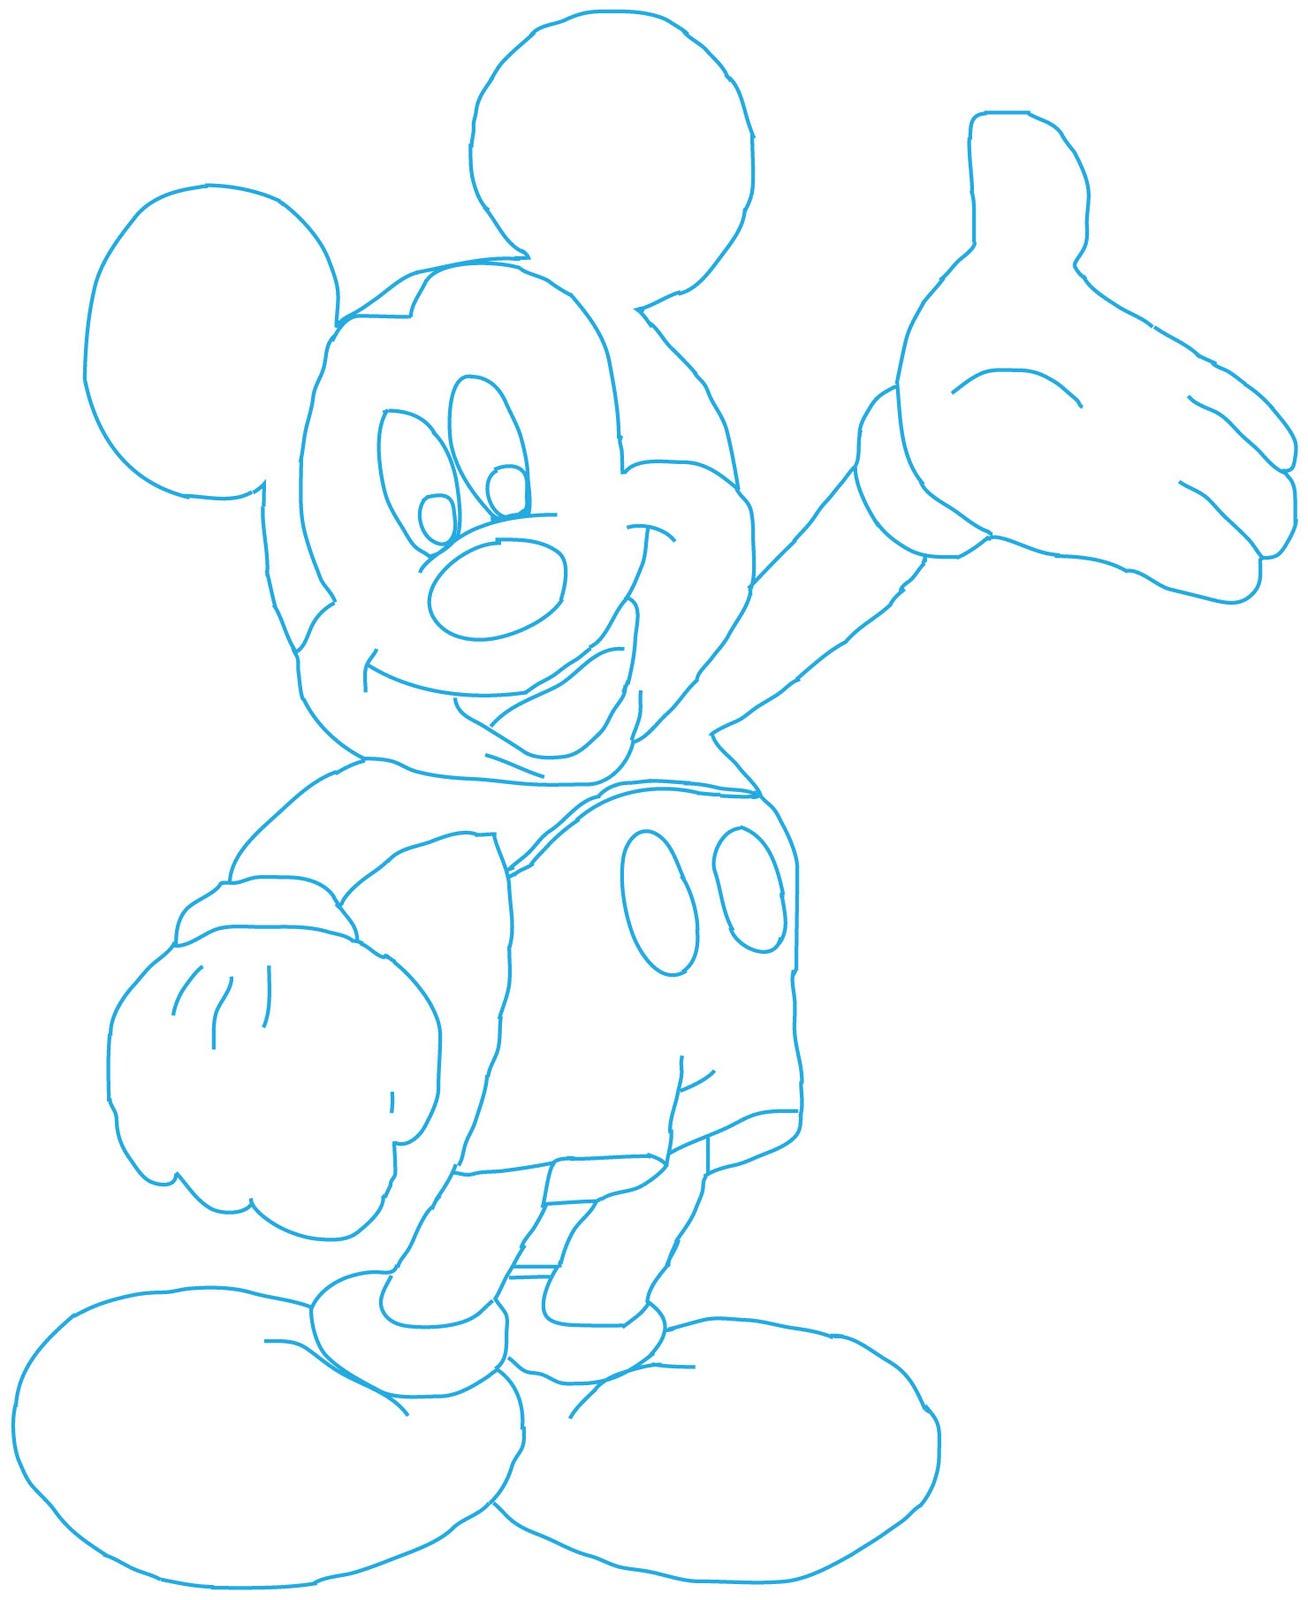 Chris Fernandez Trace Of Mickey Mouse Final